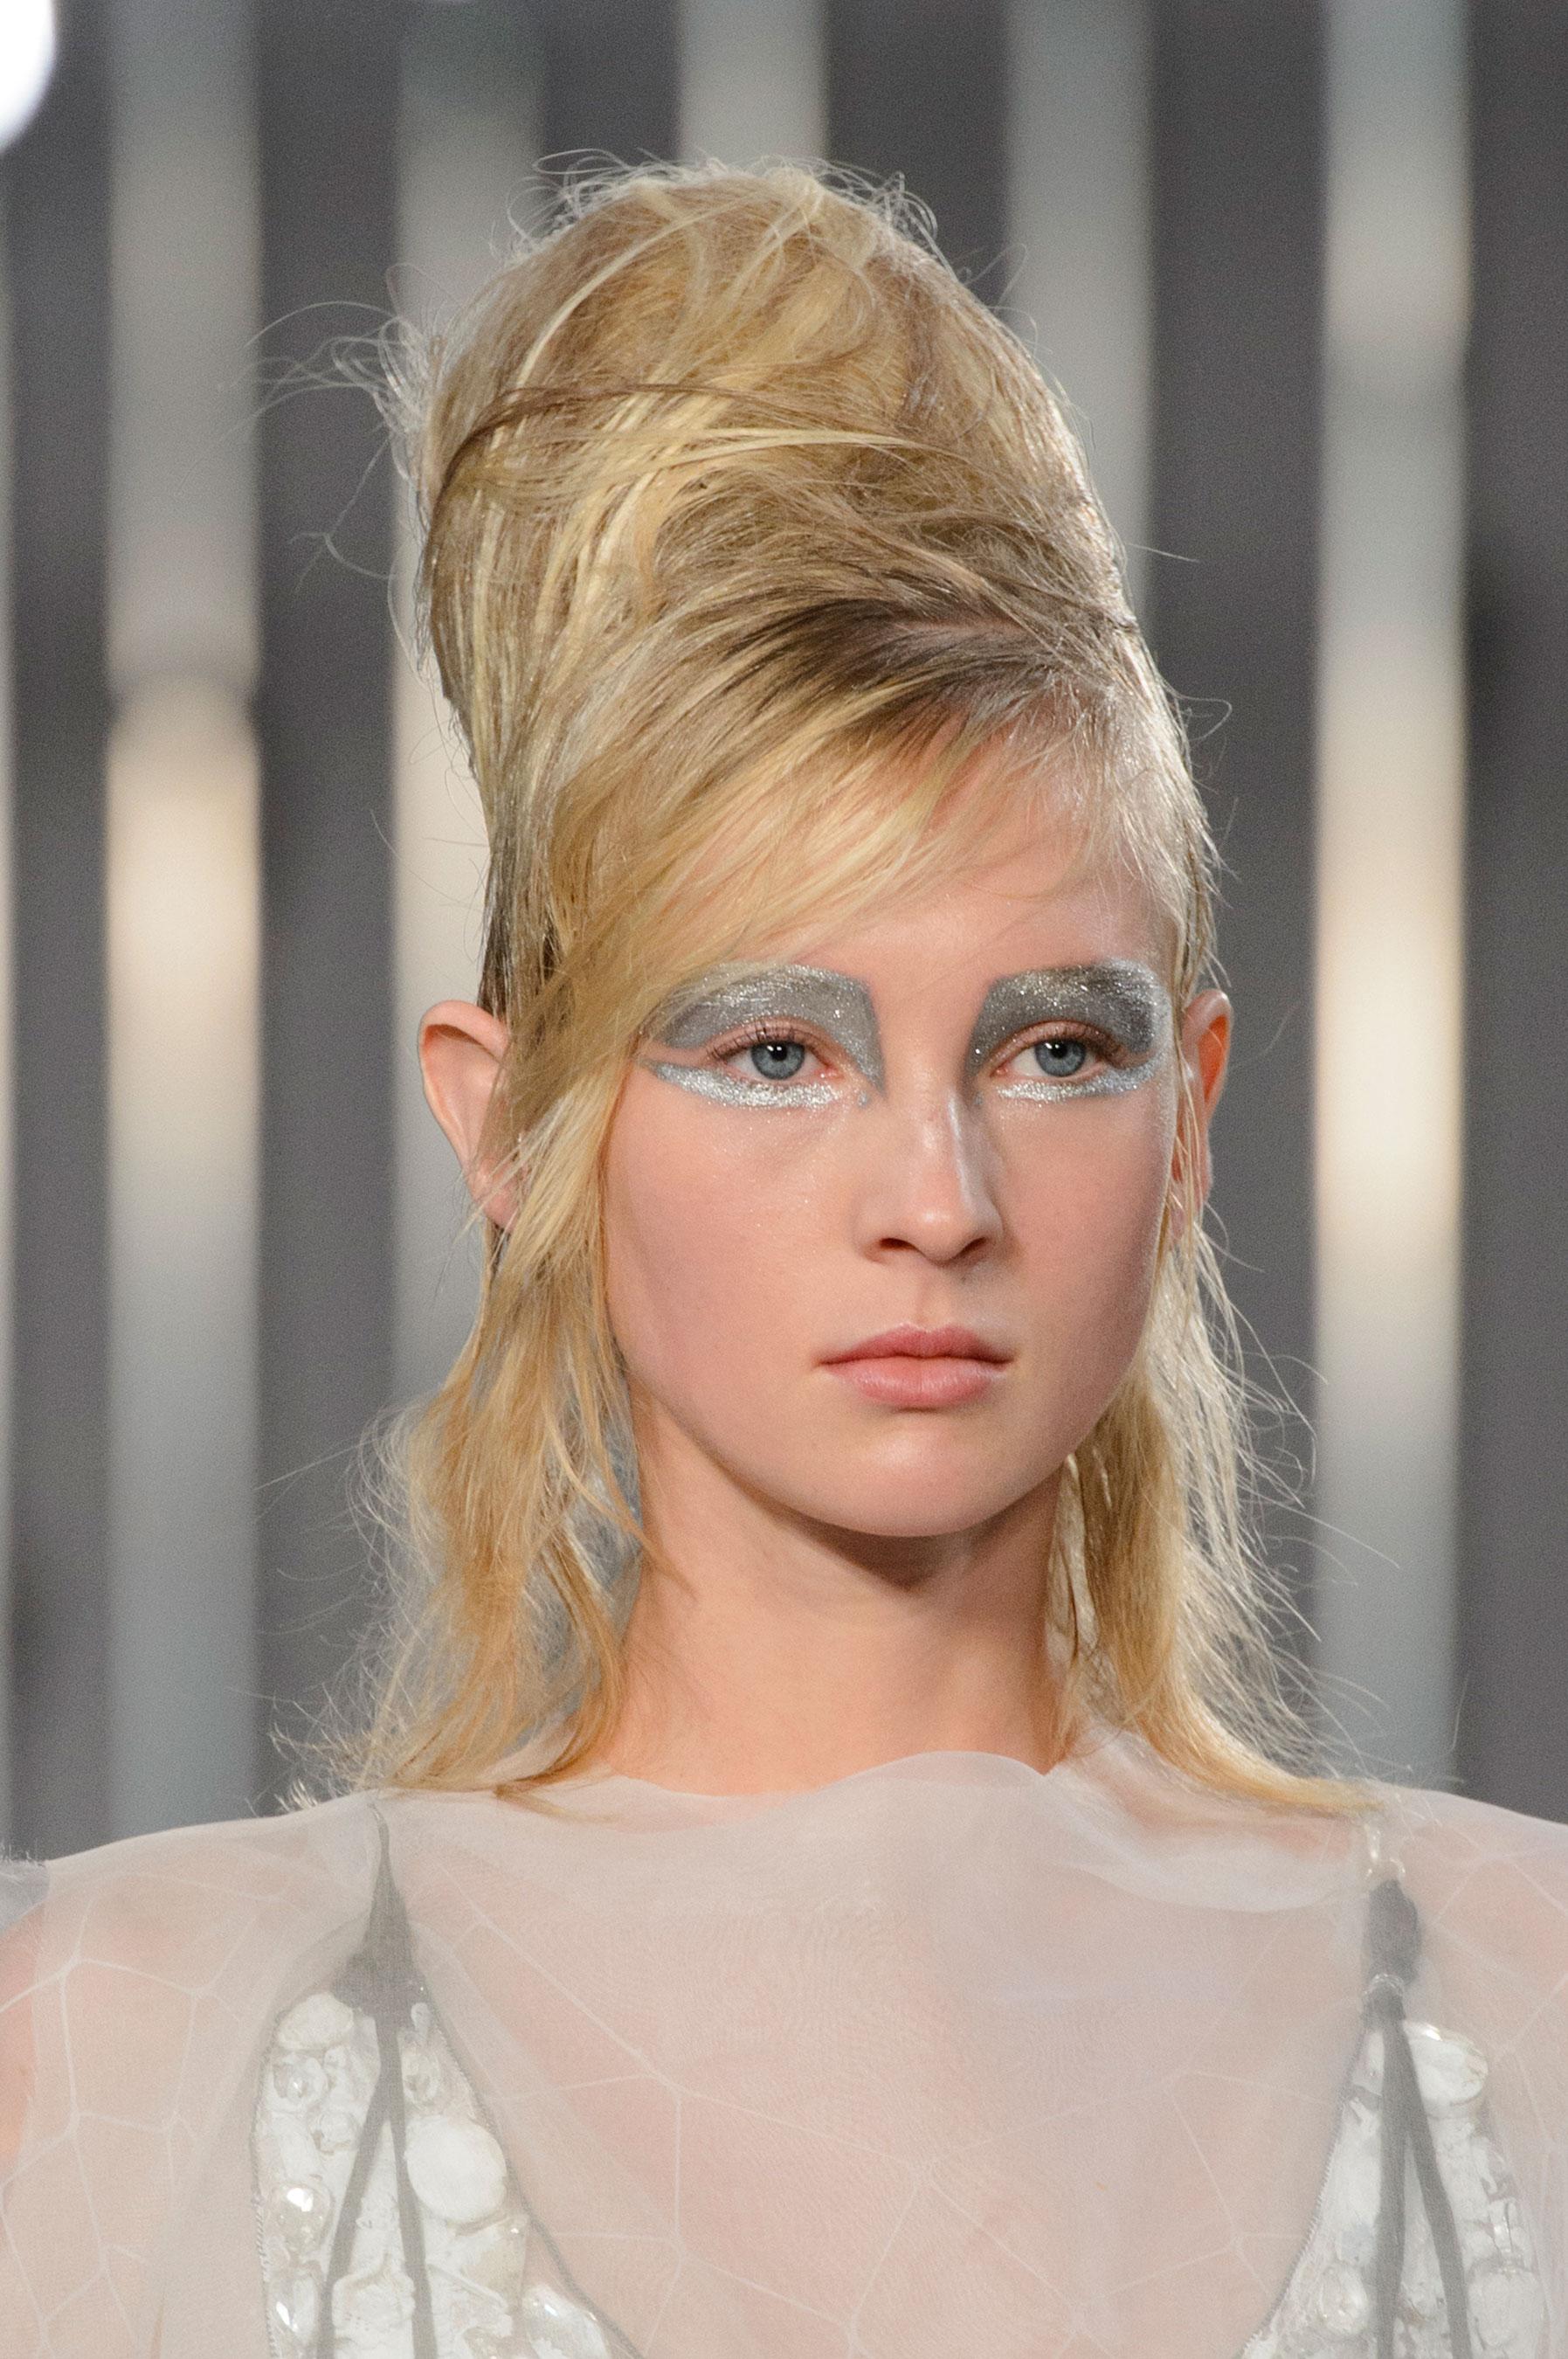 Maison-Margiela-spring-2016-runway-beauty-fashion-show-the-impression-002